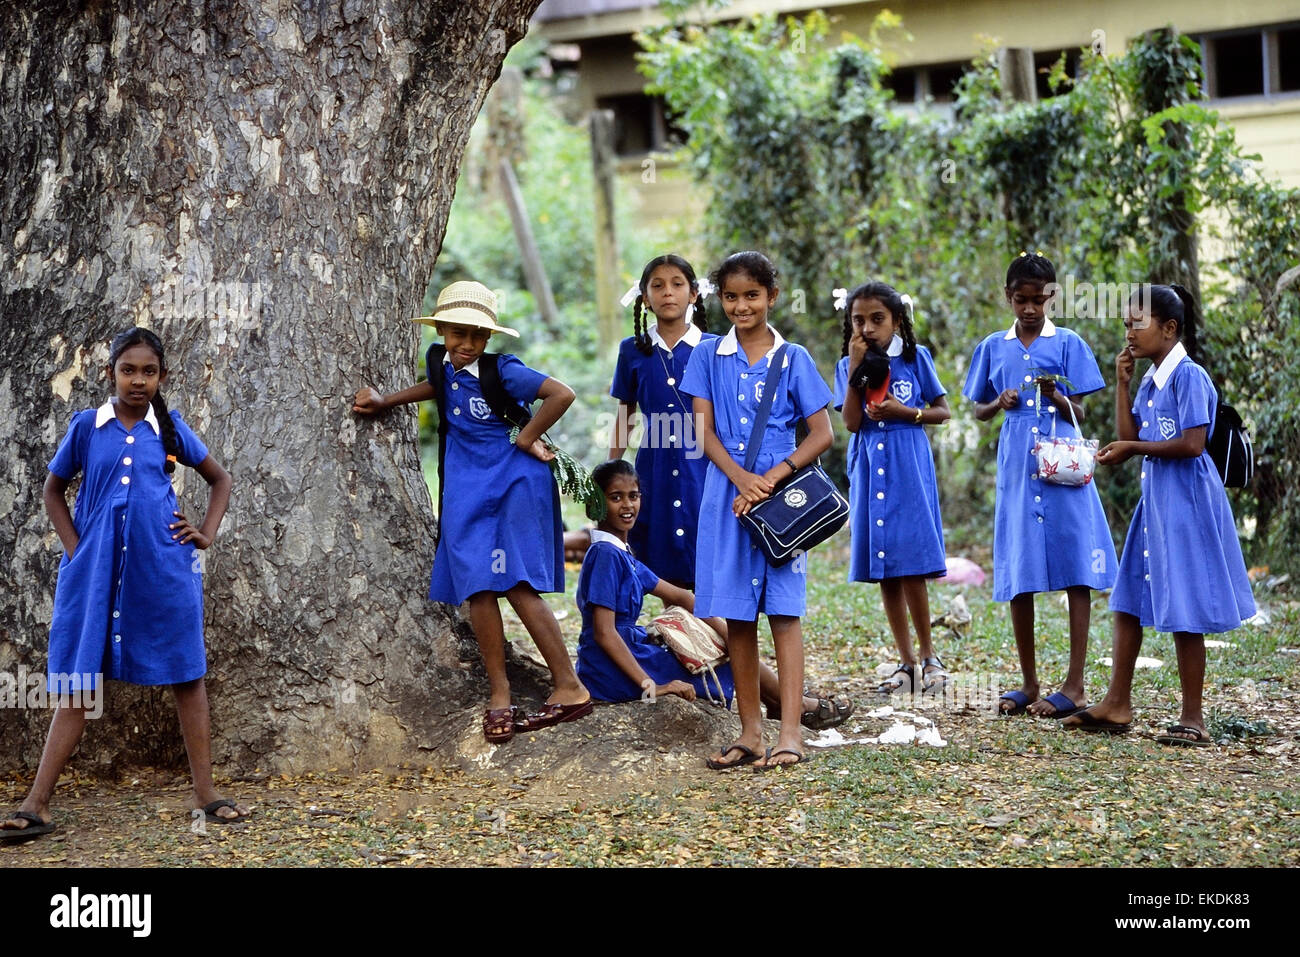 Schoolchildren at Churchill Park. Lautoka. Fiji. South Pacific. - Stock Image